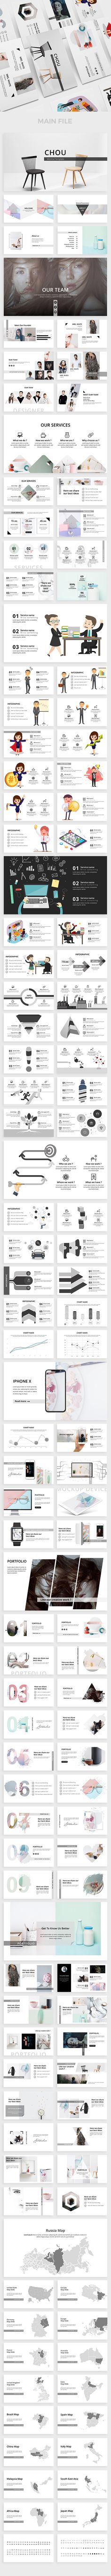 Lpo Template Designlife Hwlbl2014 On Pinterest